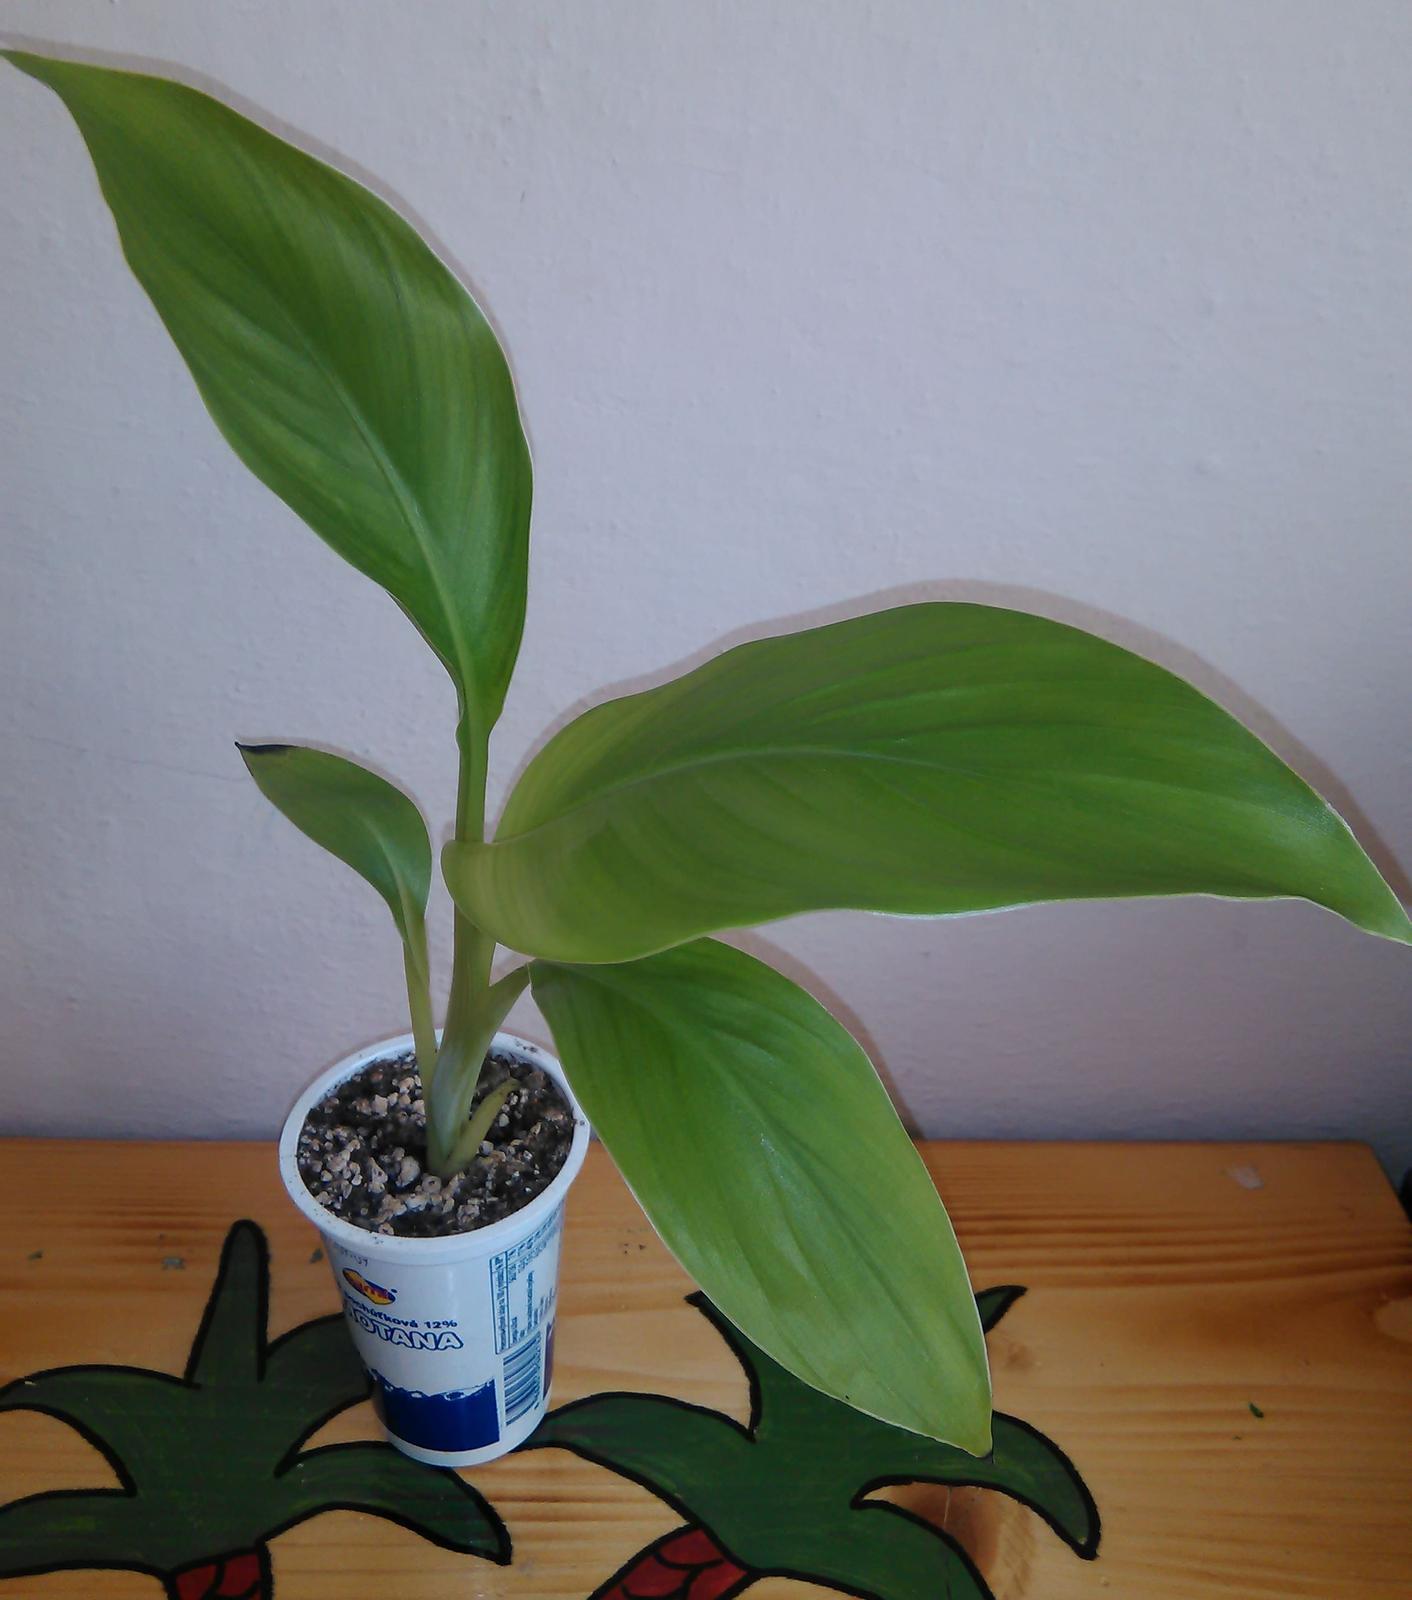 Banánovník Ensete ventricosum (semená) - Obrázok č. 3